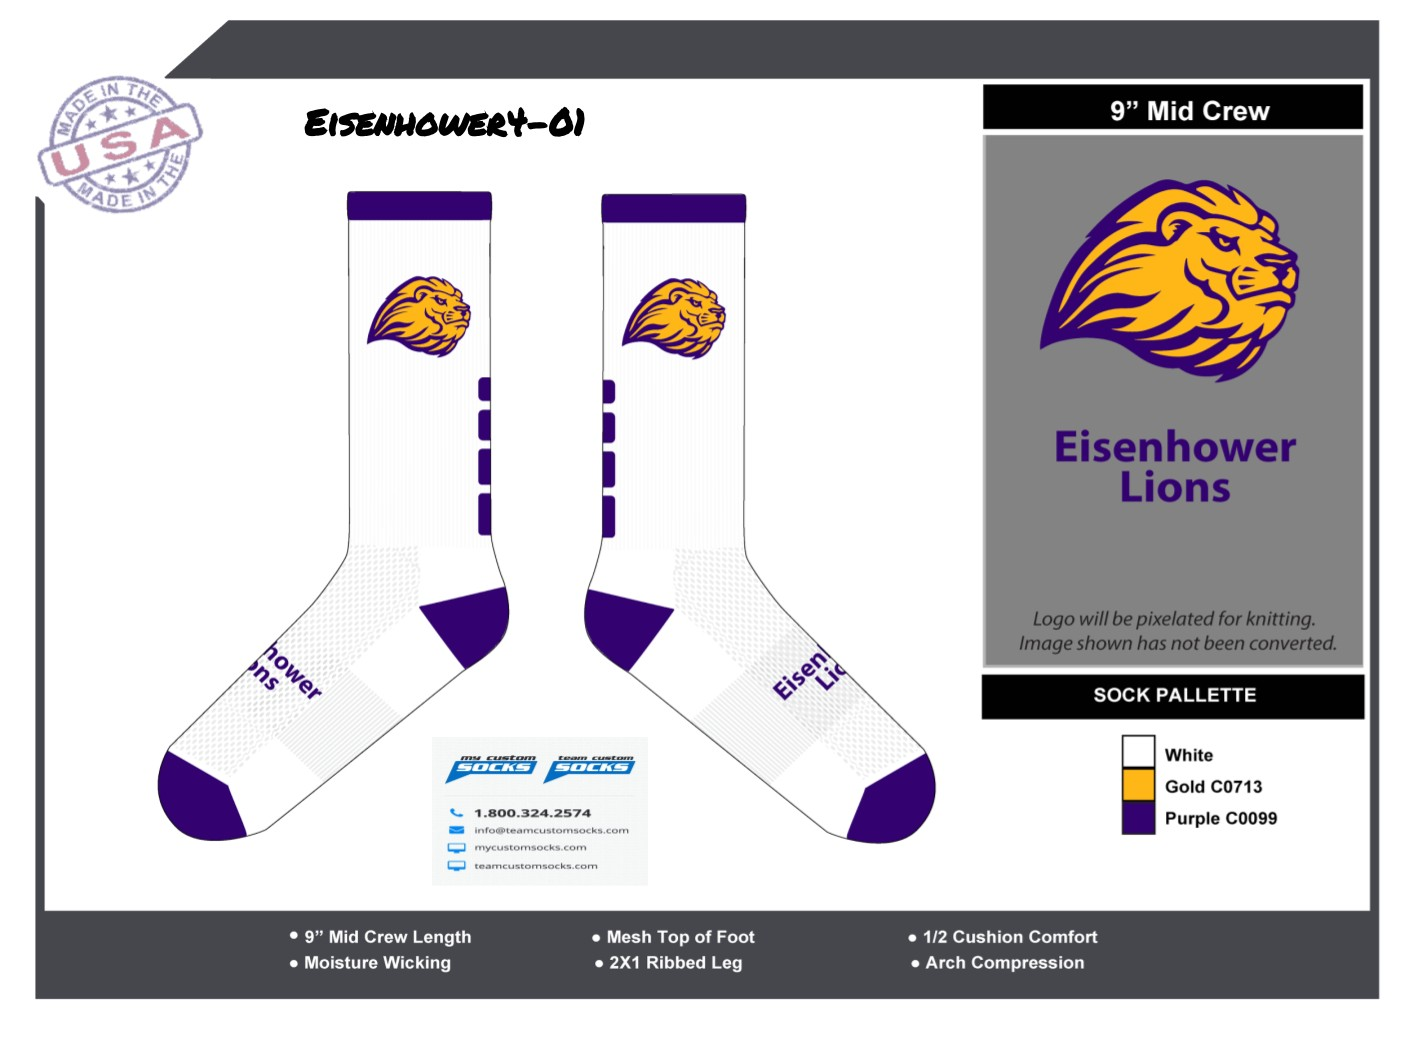 Eisenhower Lions